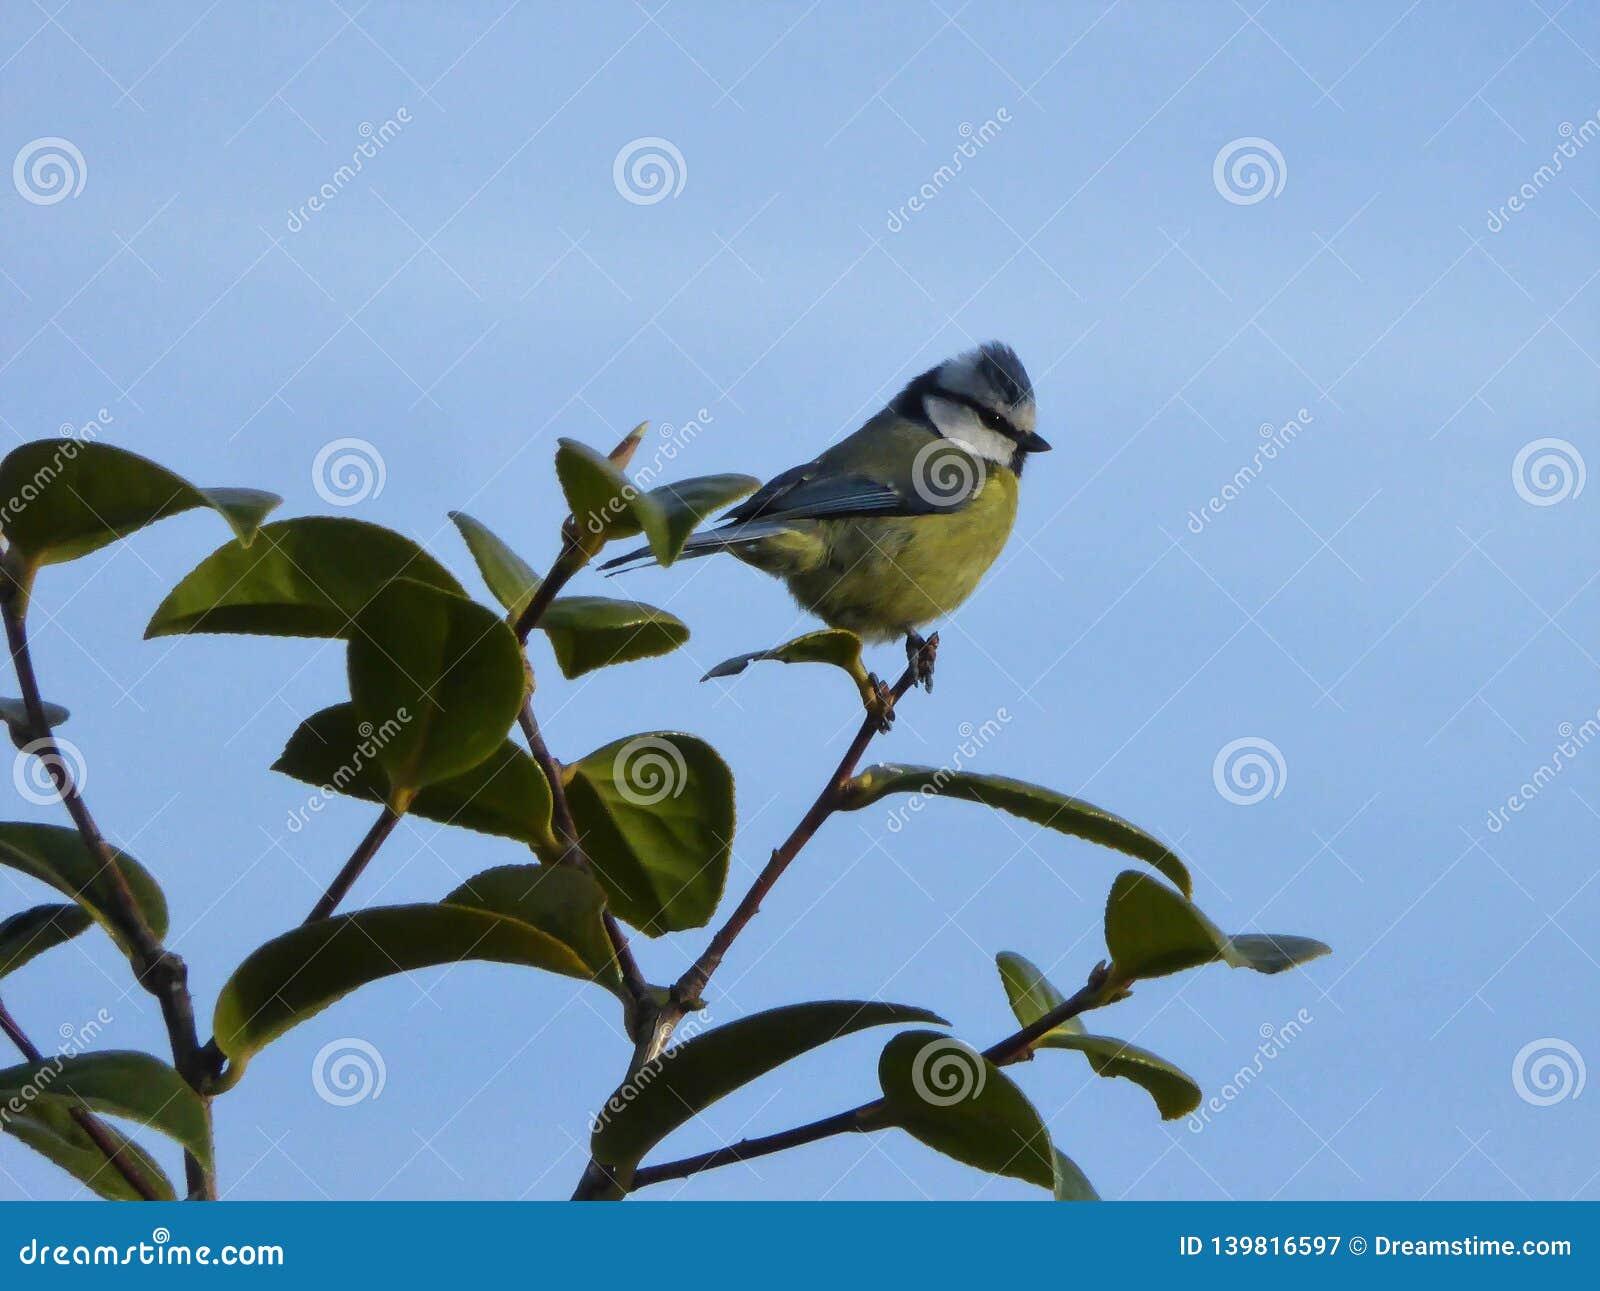 Bluetit on a leaf